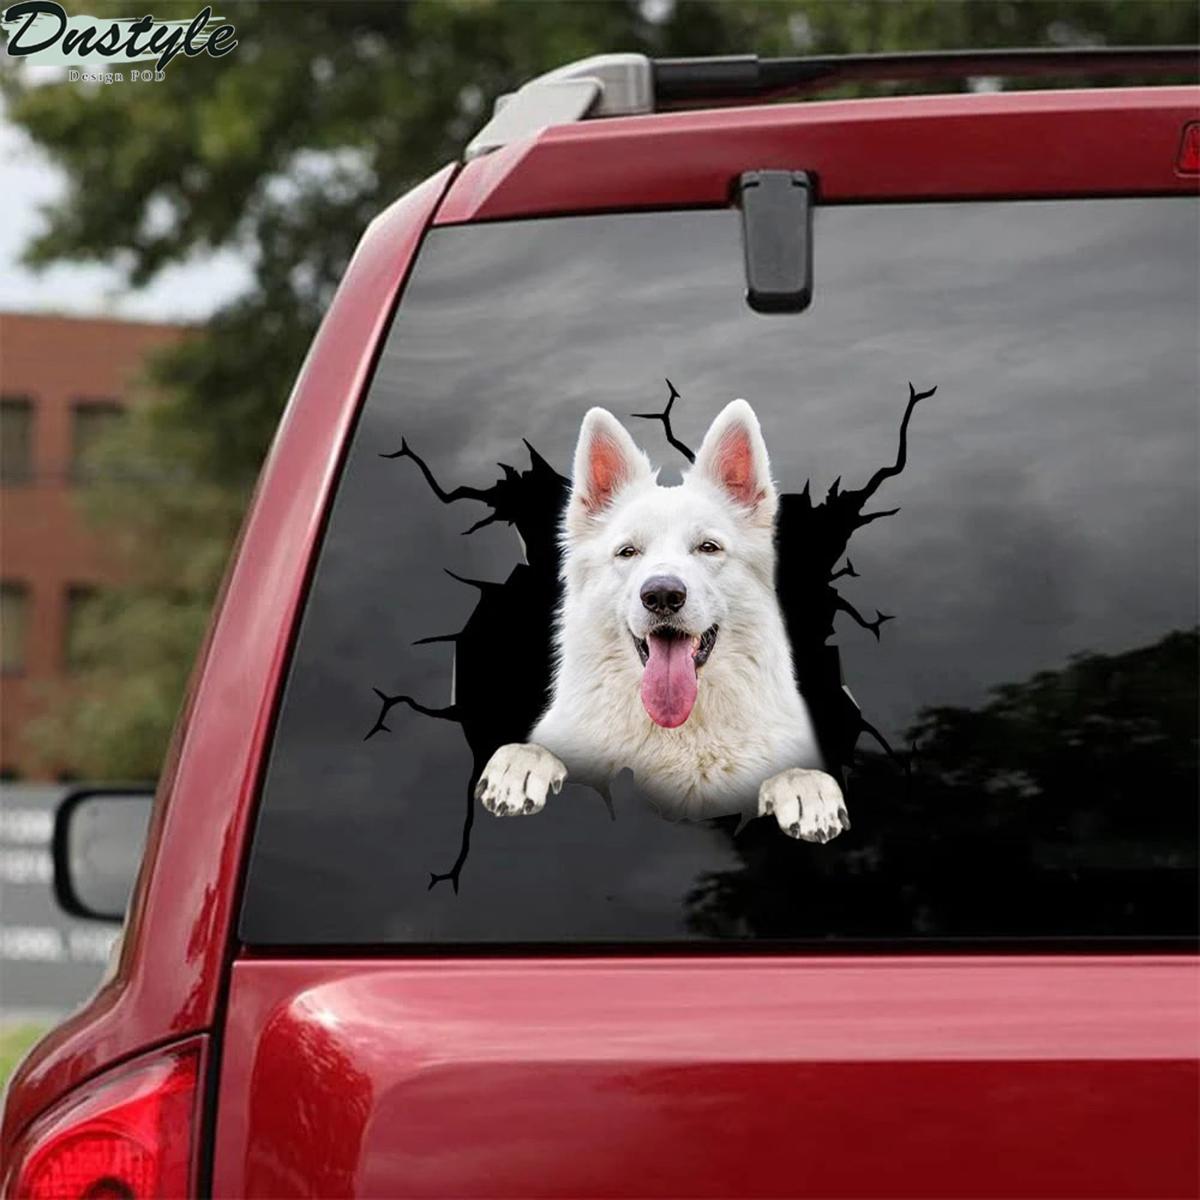 German shepherd white crack car decal sticker 1